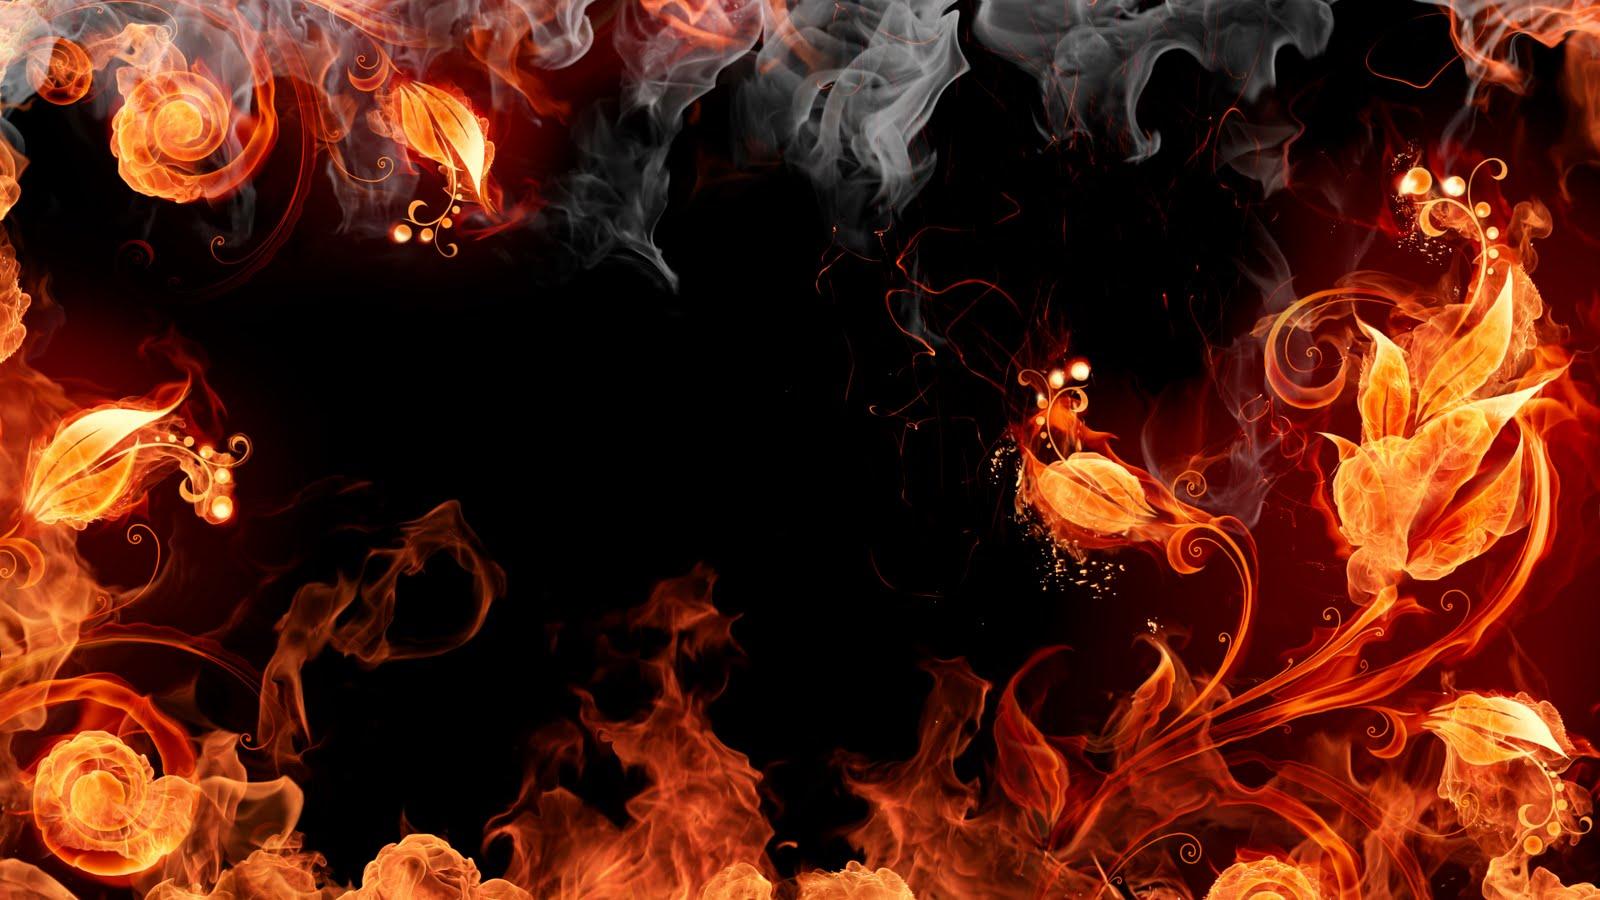 Fire Element High Definition Wallpapers Backgrounds Wallpaper Hd 1600x900